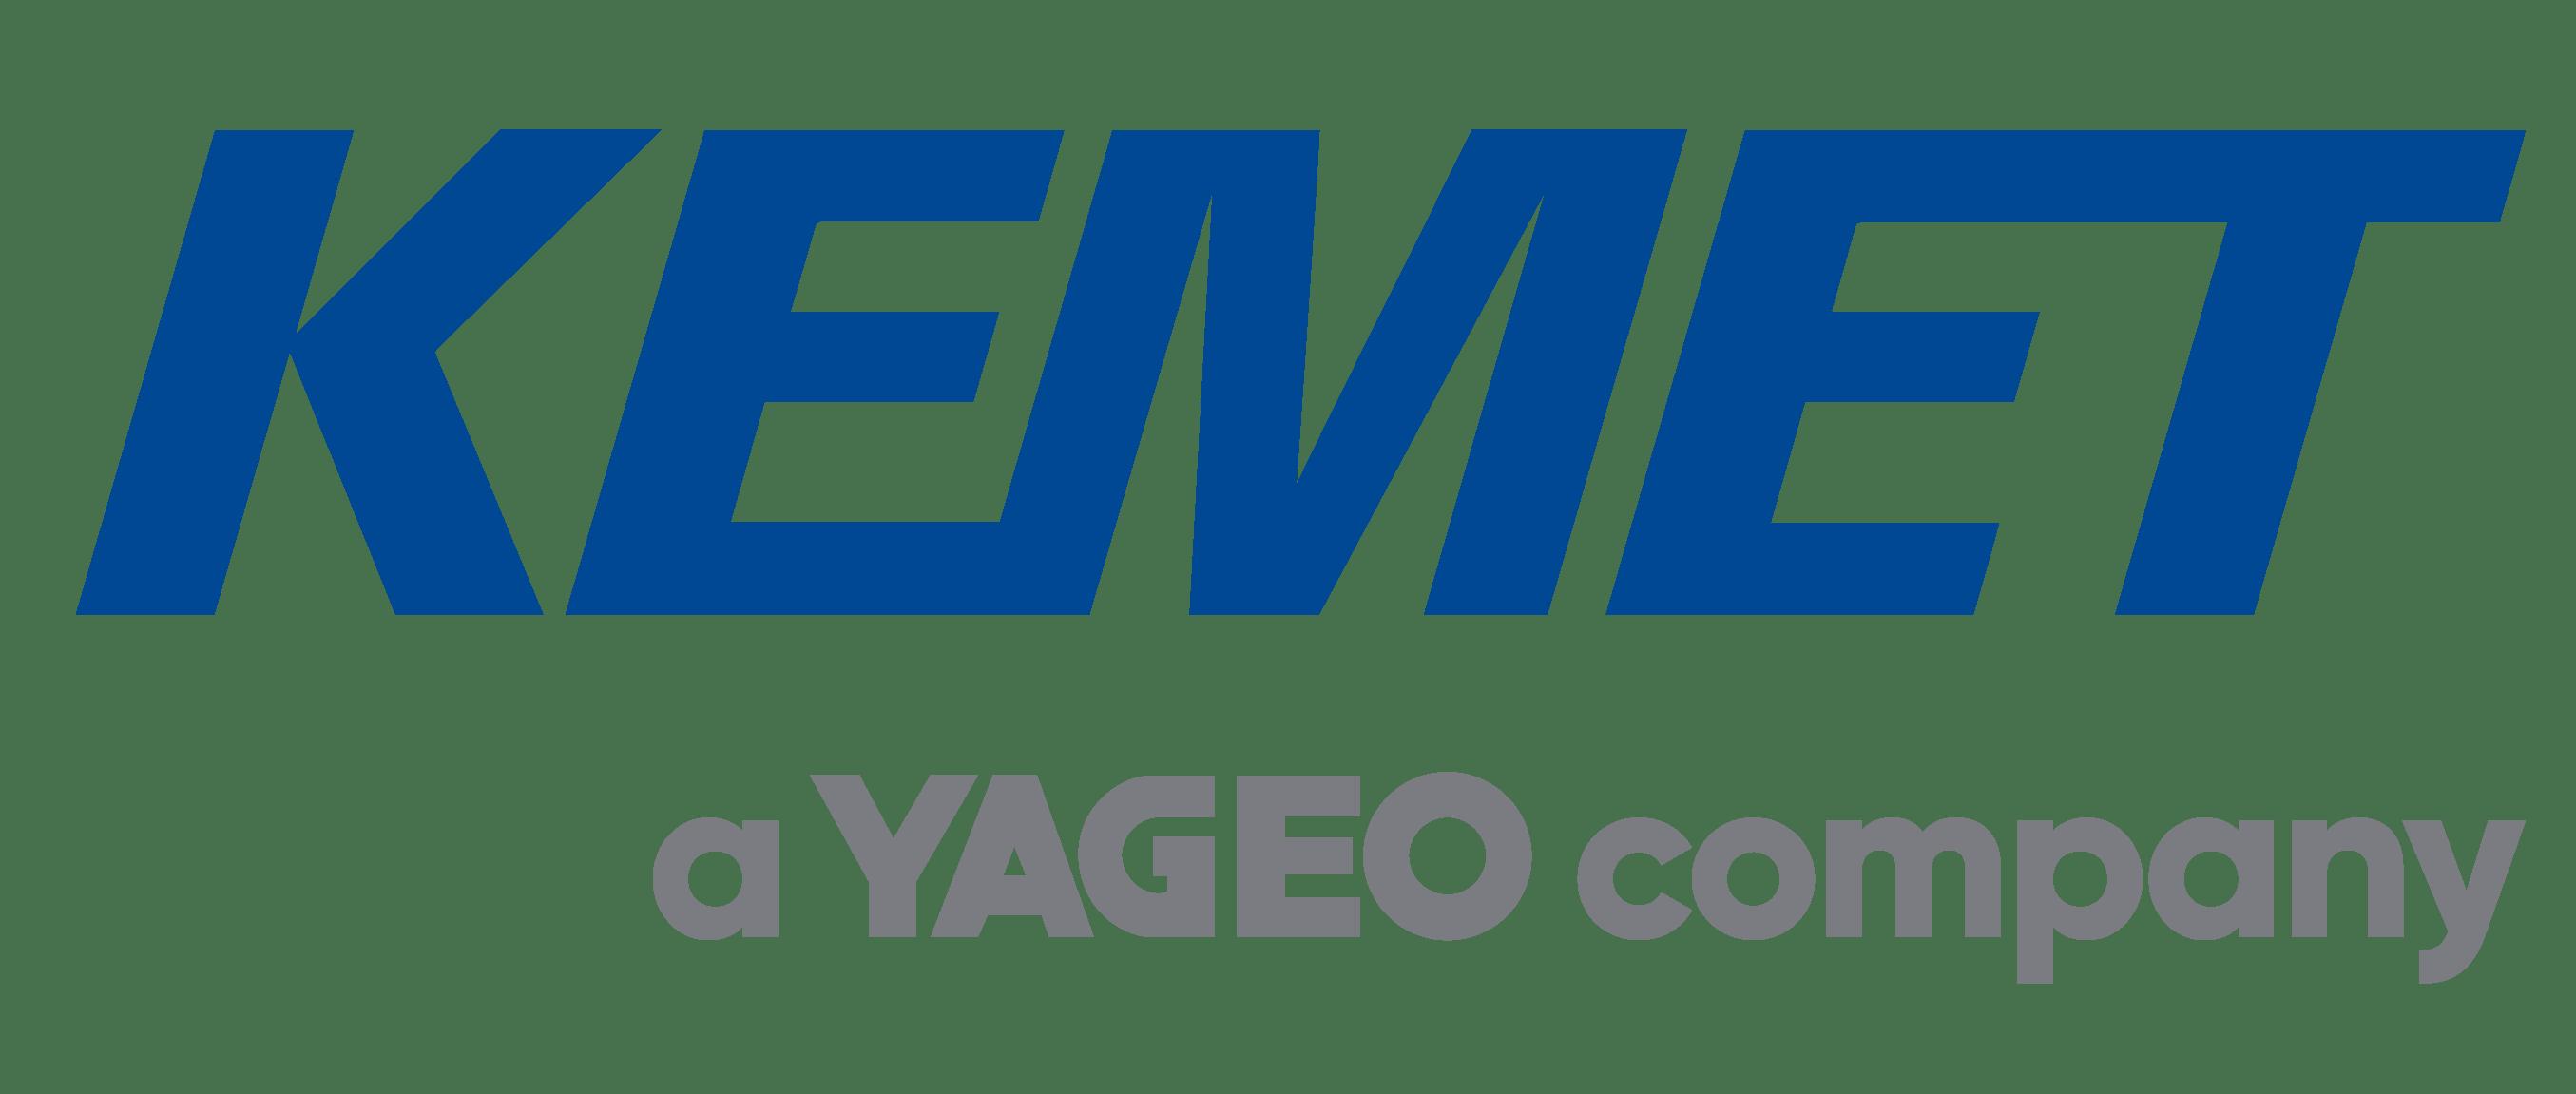 KEMET_YAGEO_website_logo__3